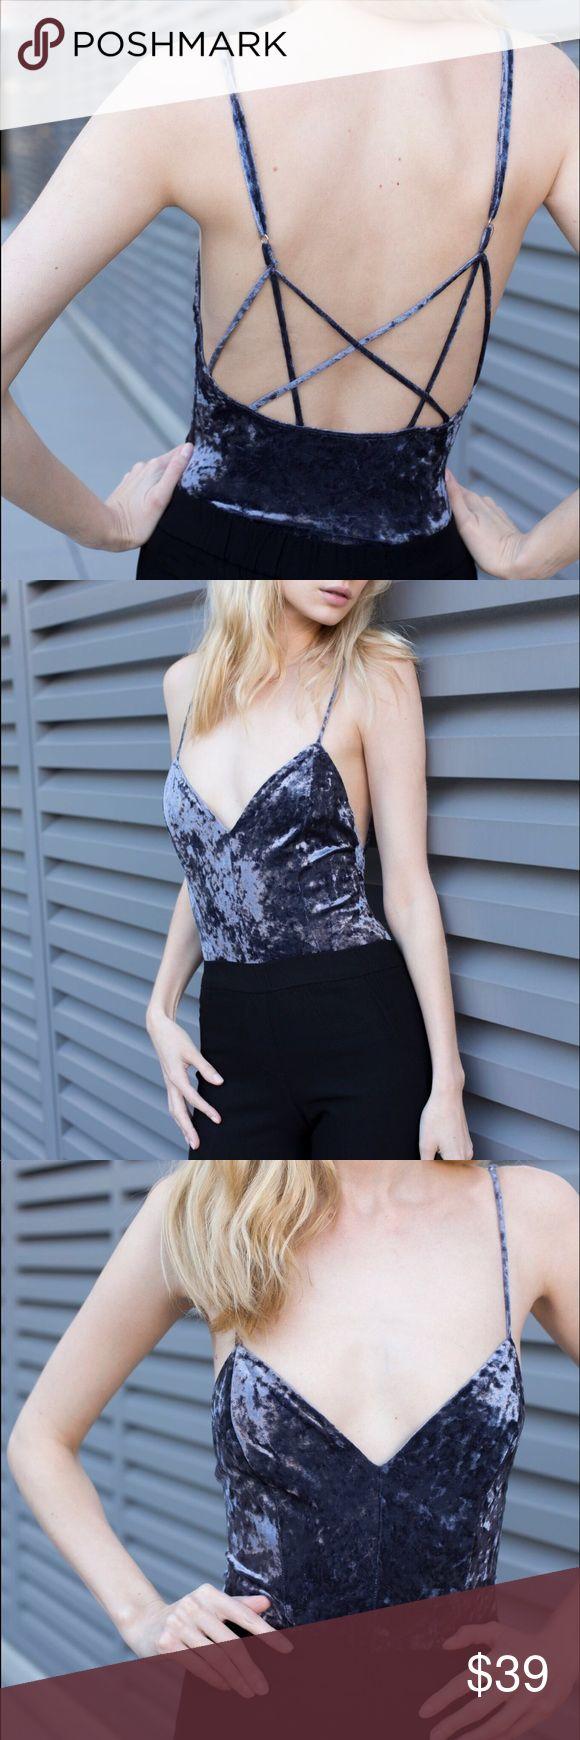 Strappy Back Velvet Bodysuit Soft brushed velvet. Straps are adjustable.  Color: Gun Metal  97% polyester, 3% spandex  Made in USA 🇺🇸 Tops